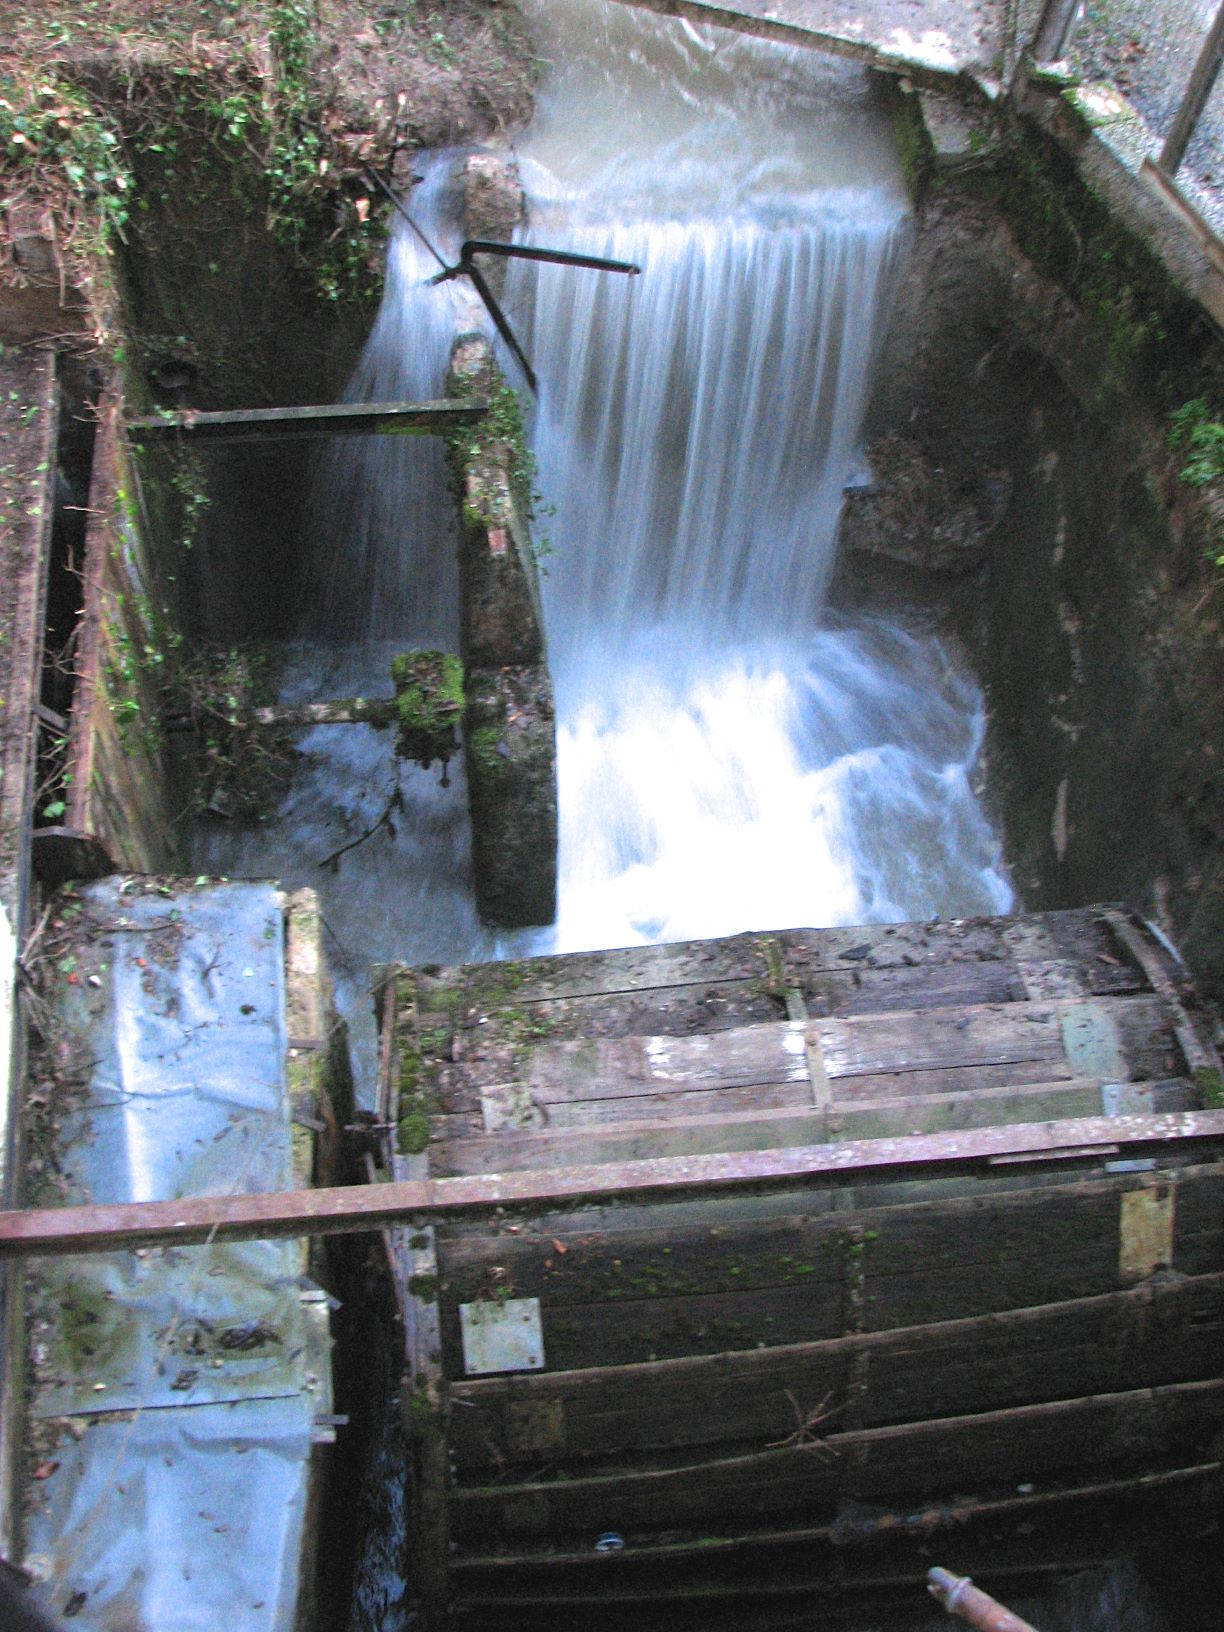 Moulin de l'Aube